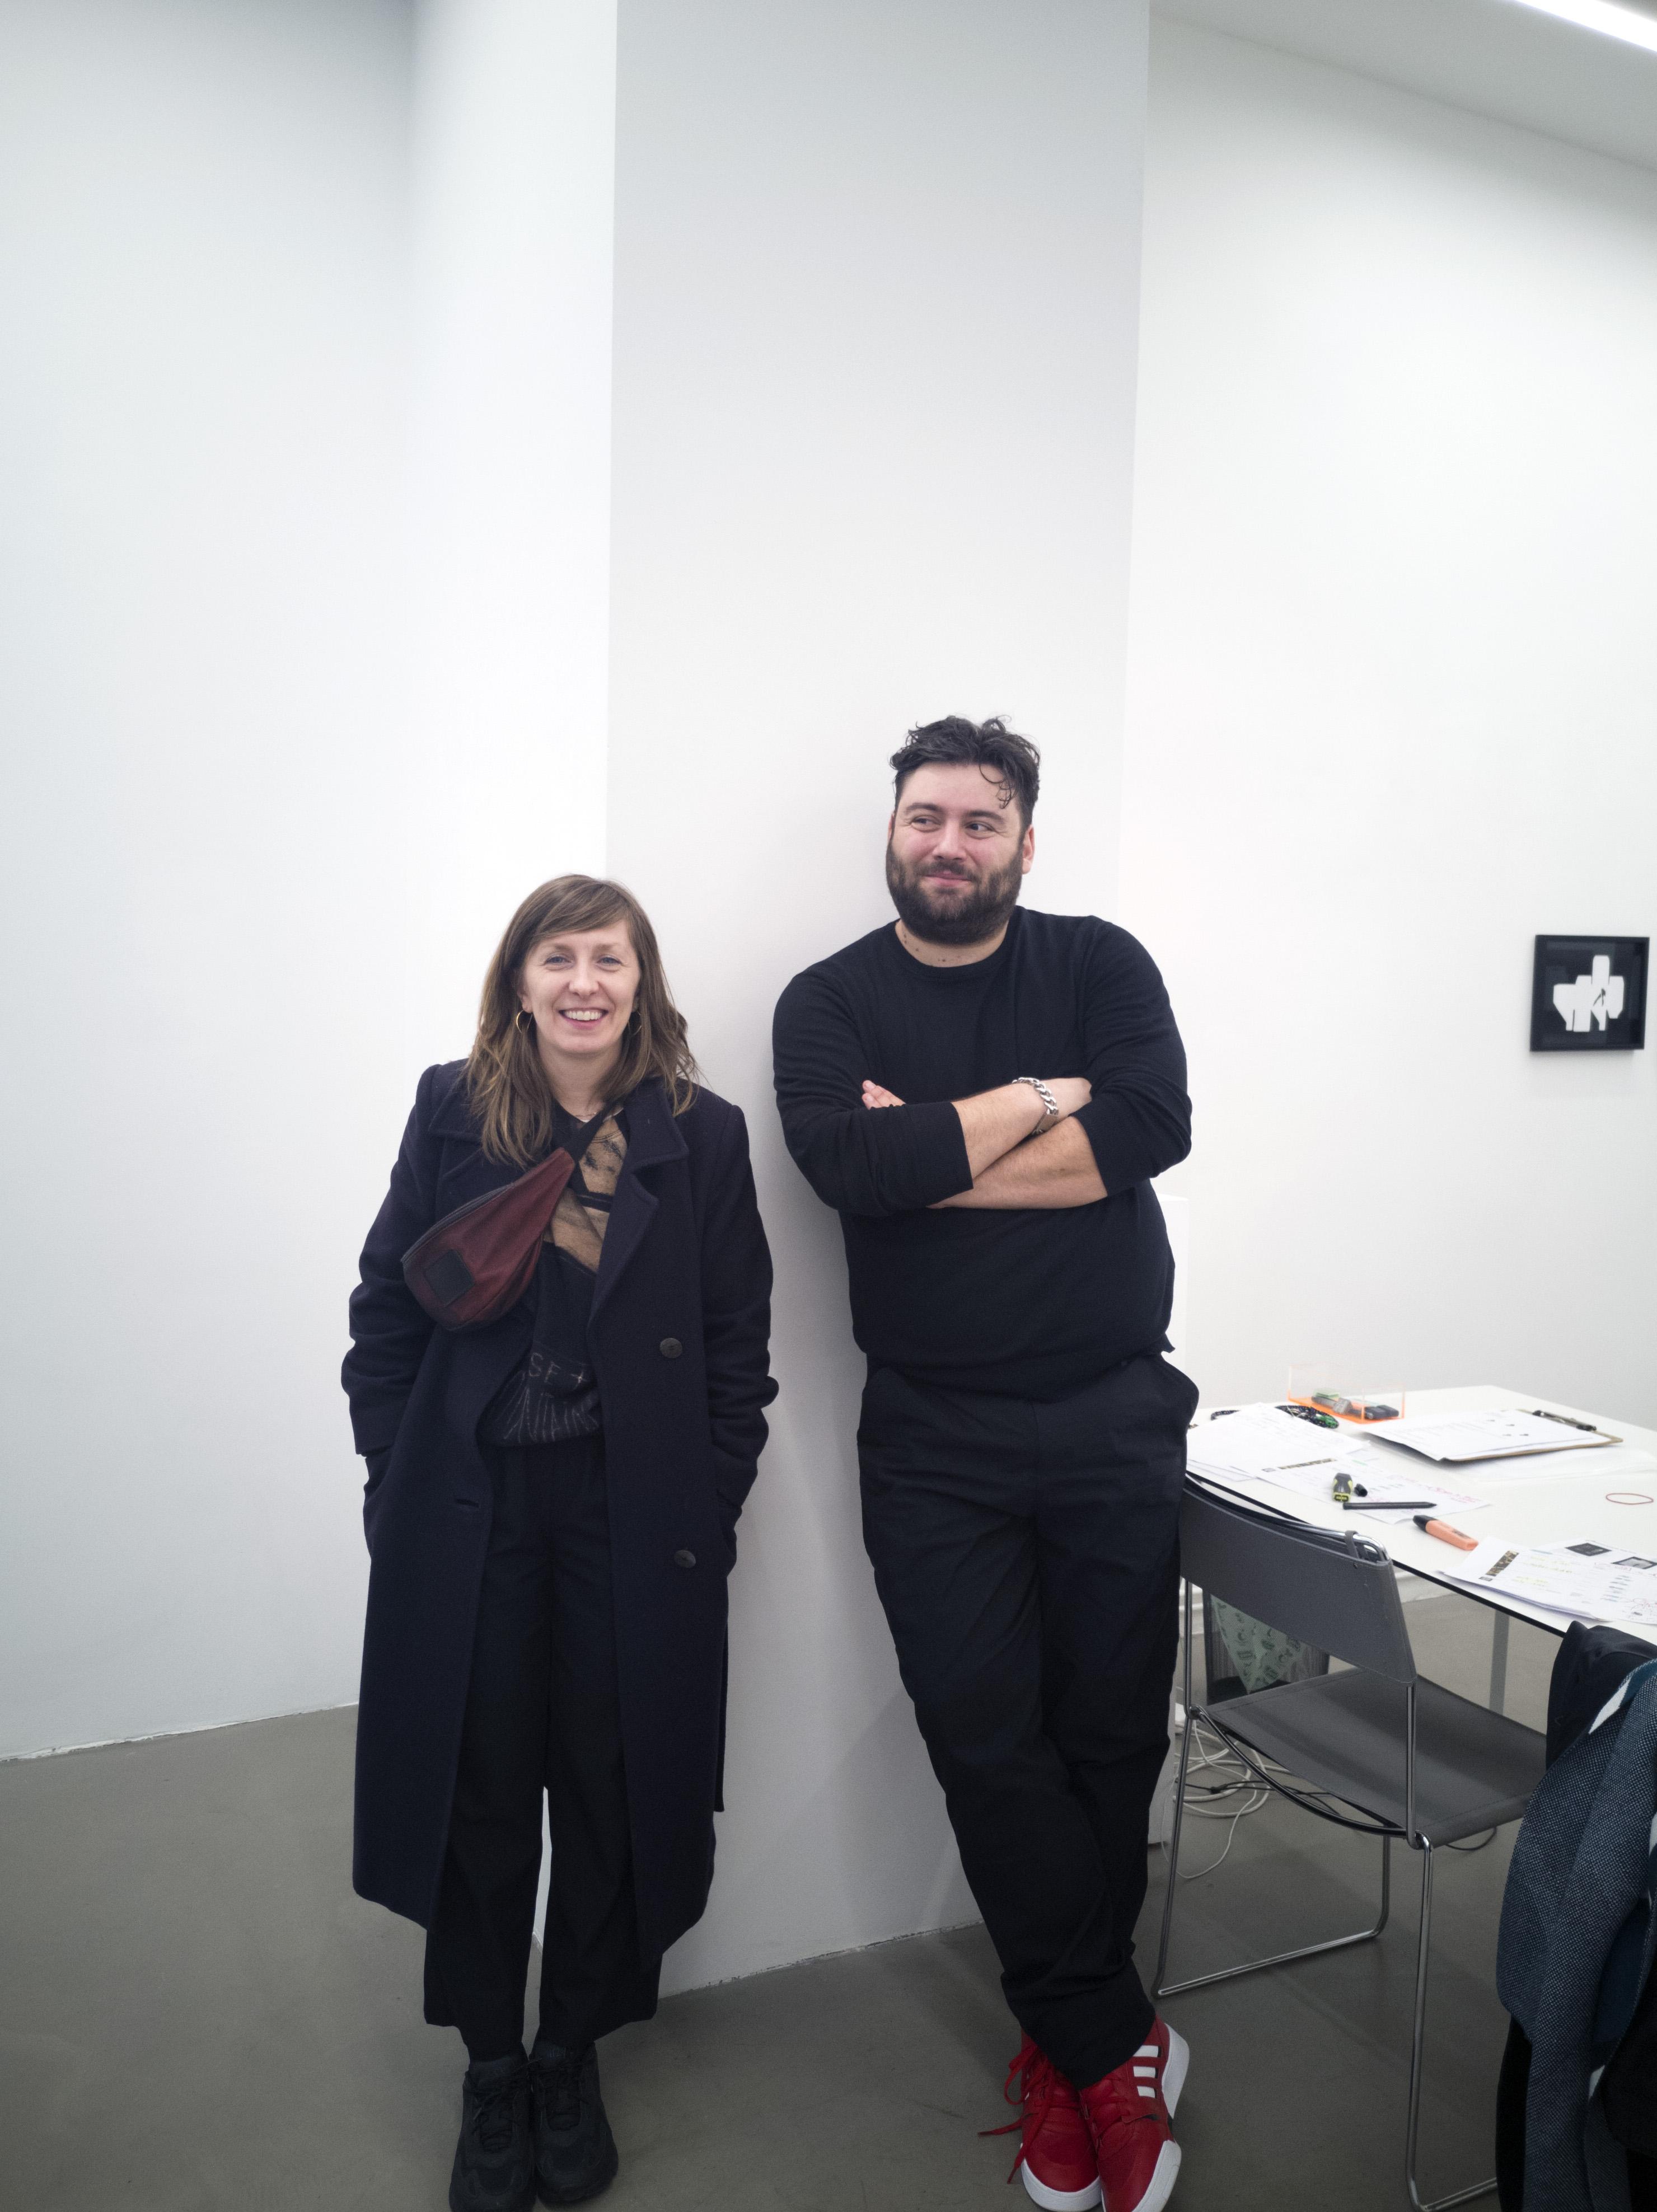 Marge Monko ja Russi Klenner. Foto: Aleksander Tsapov